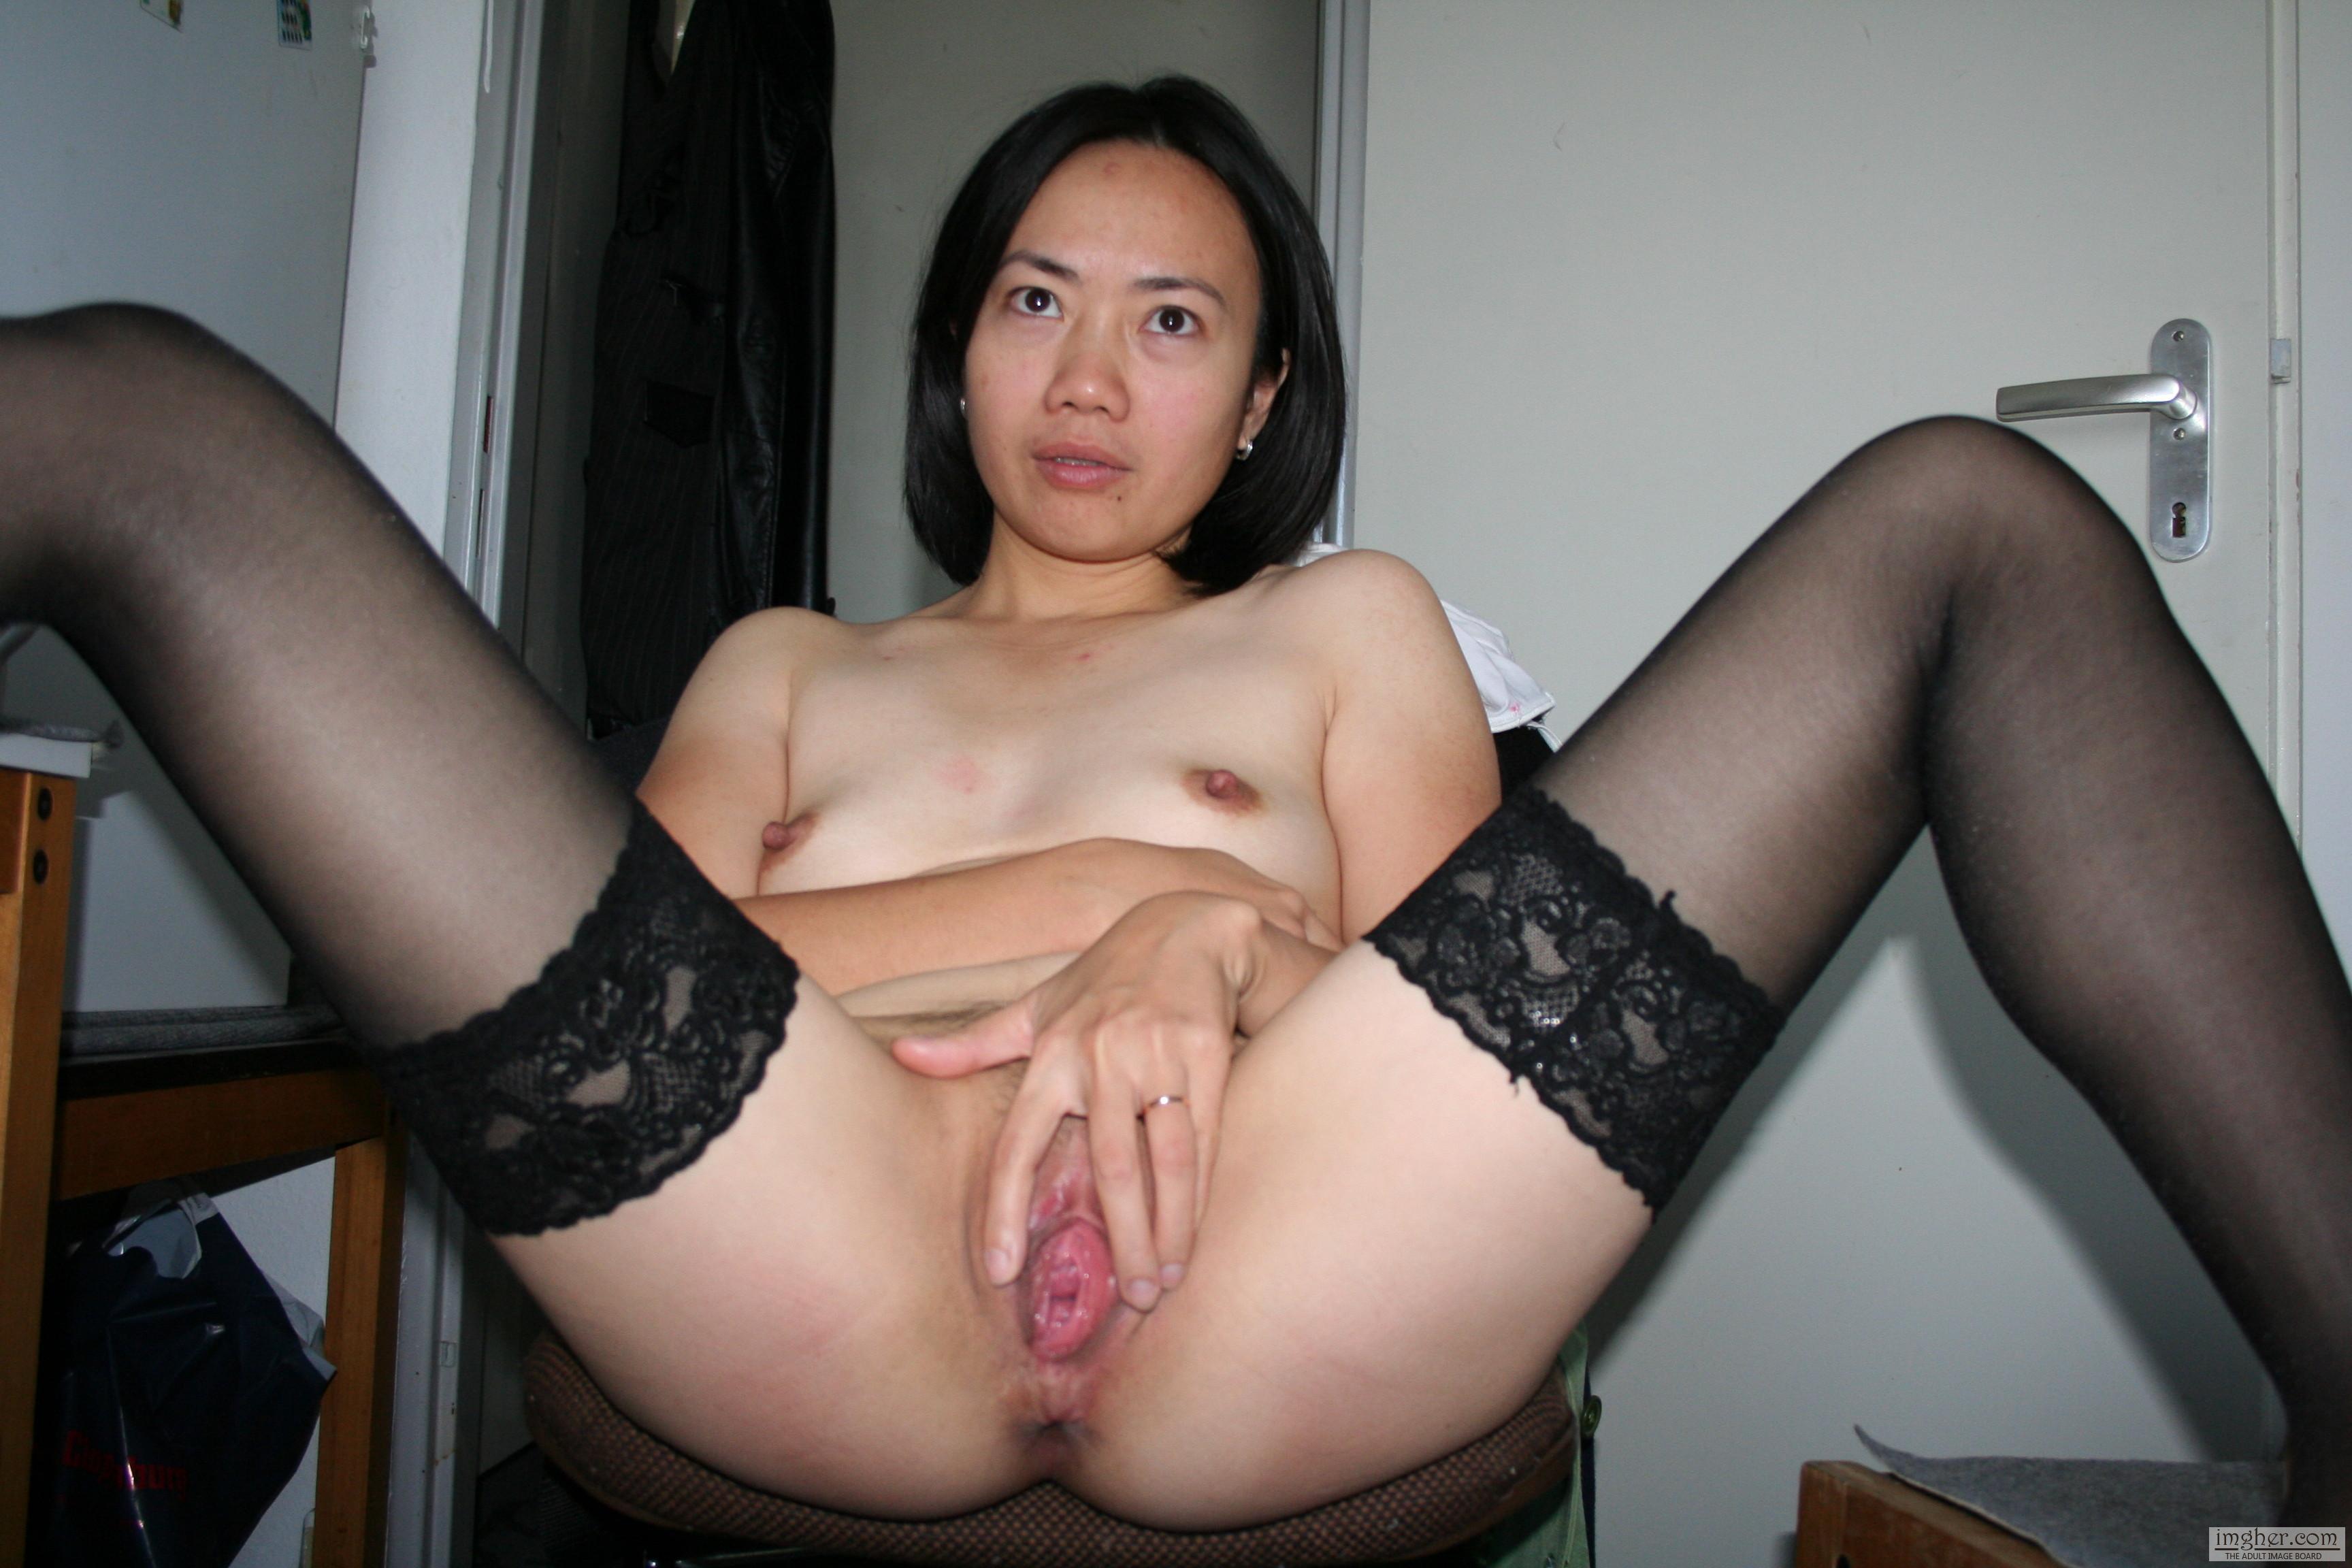 Asian Doninatrix Porn asian femdom tgp - random photo gallery. comments: 5